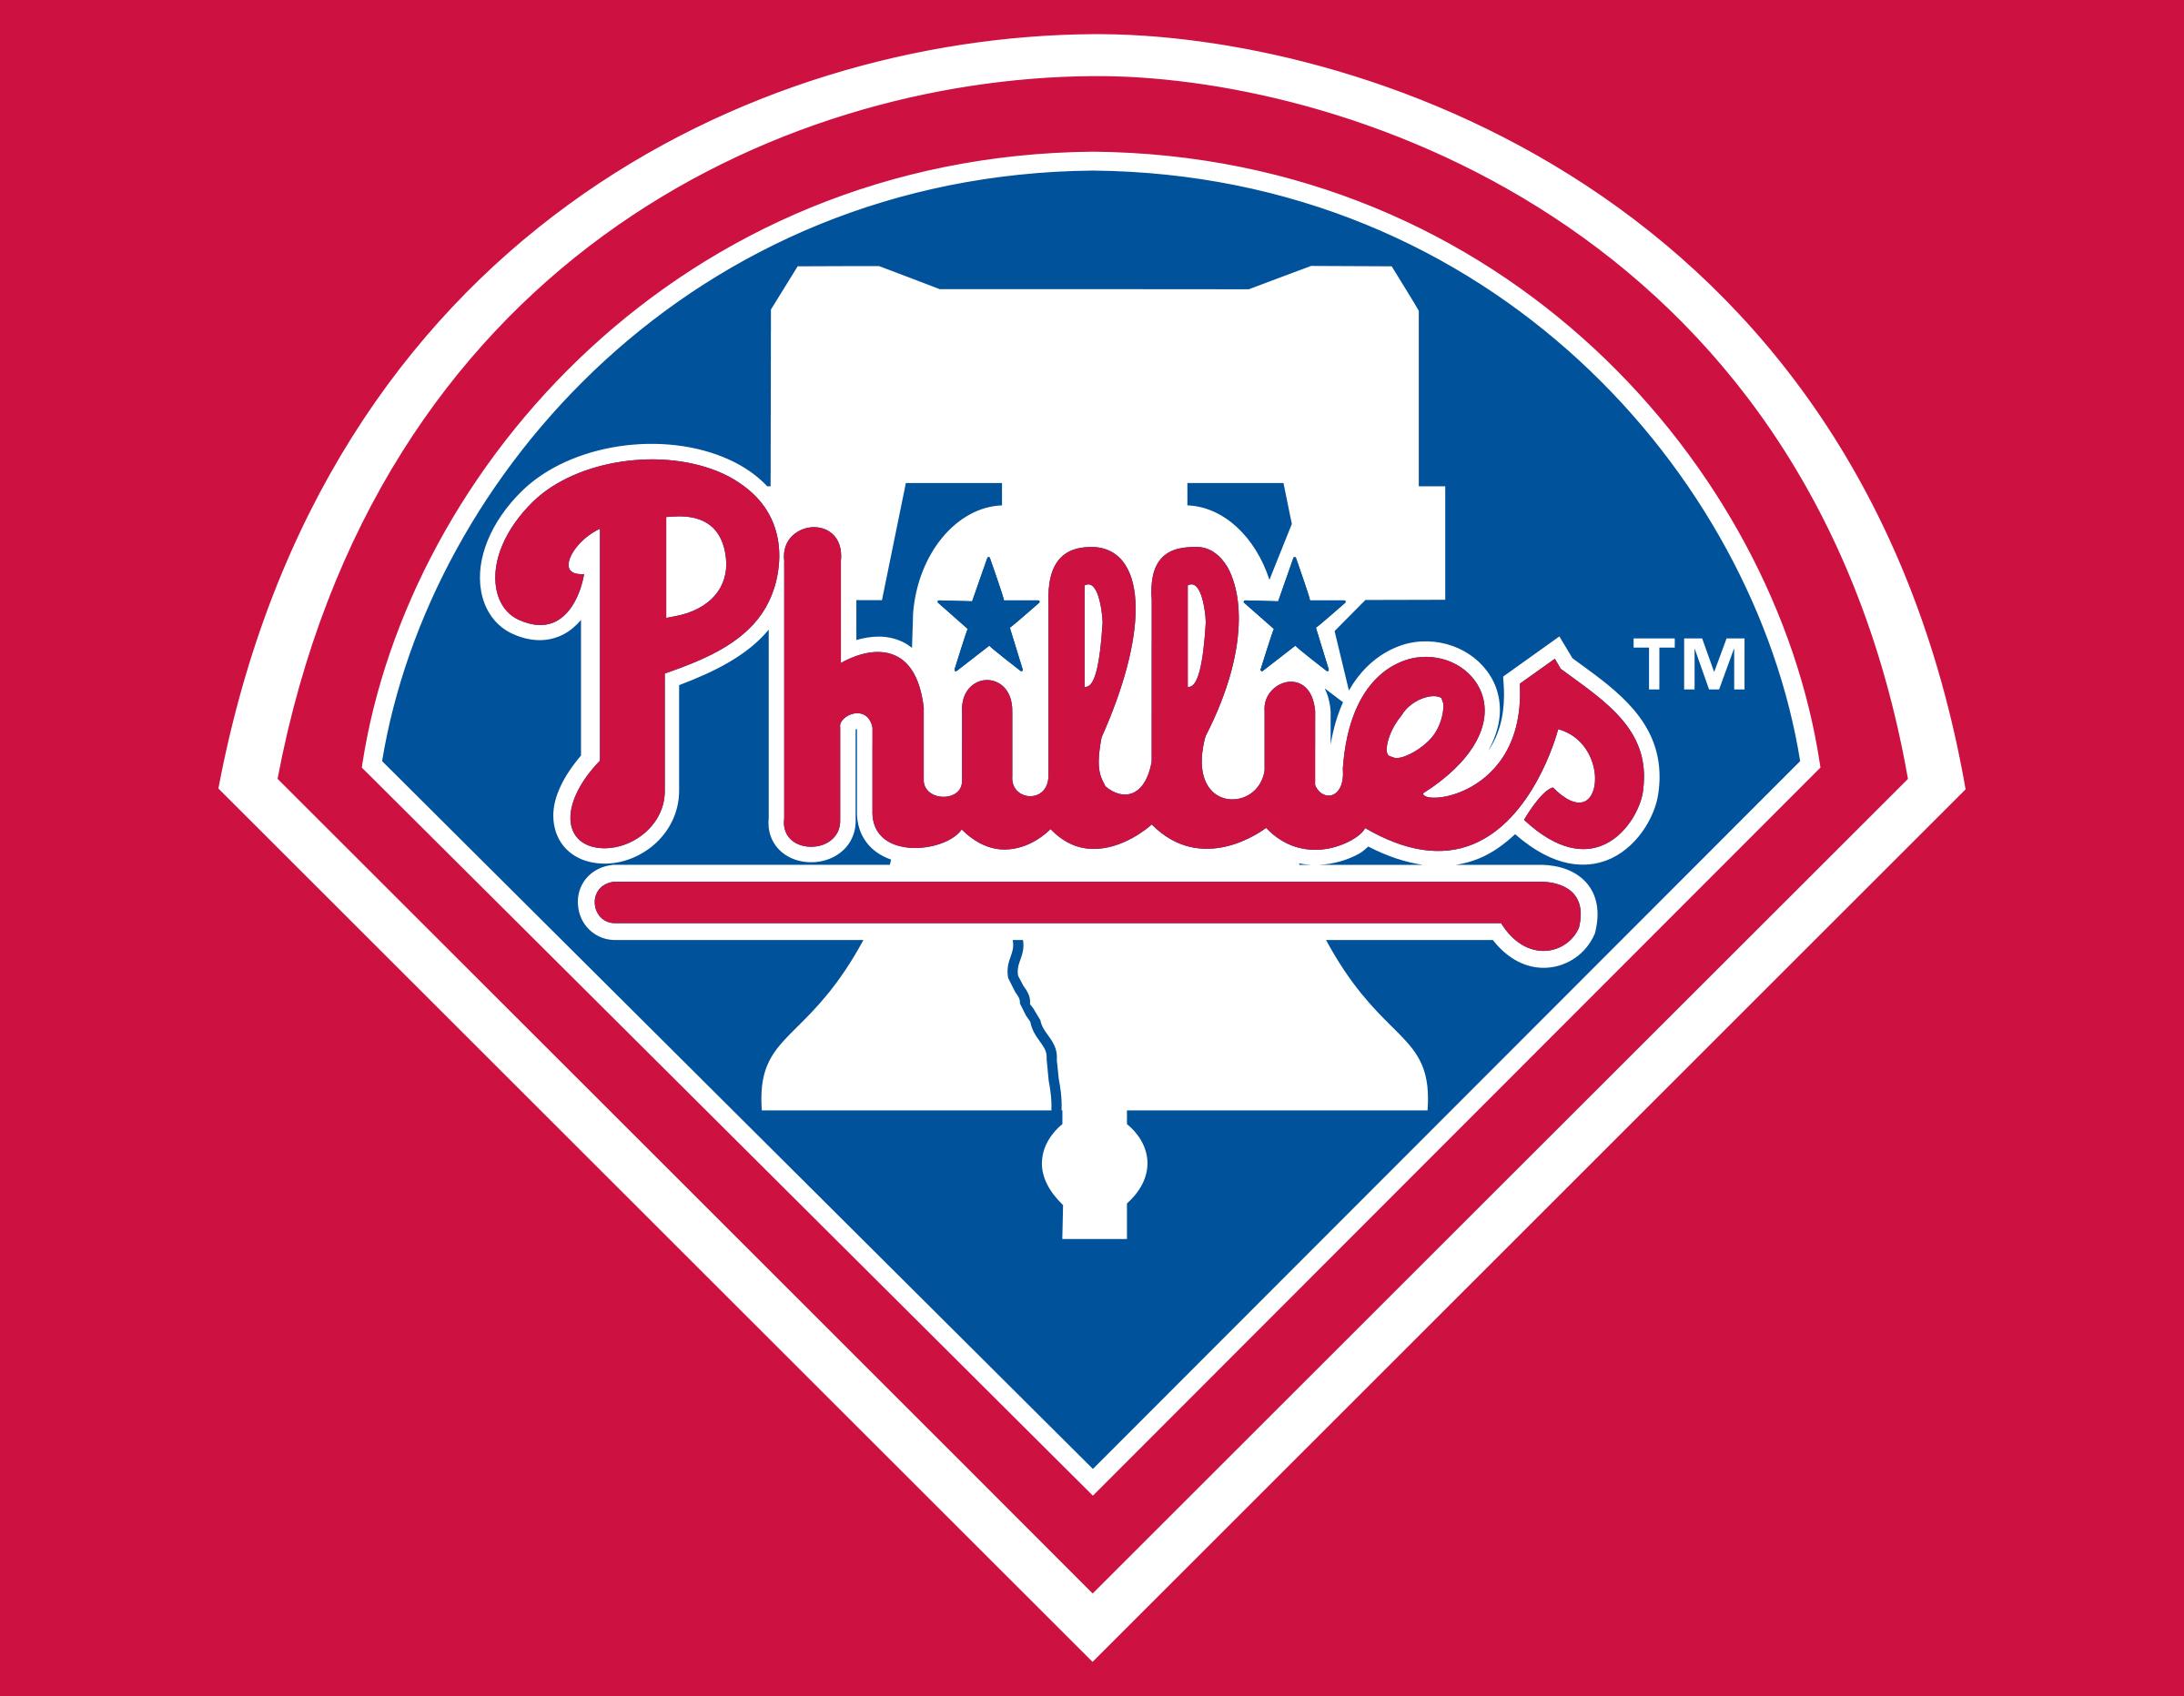 philadelphia phillies logo  phillies symbol  meaning atlanta braves logo font download atlanta braves logo font